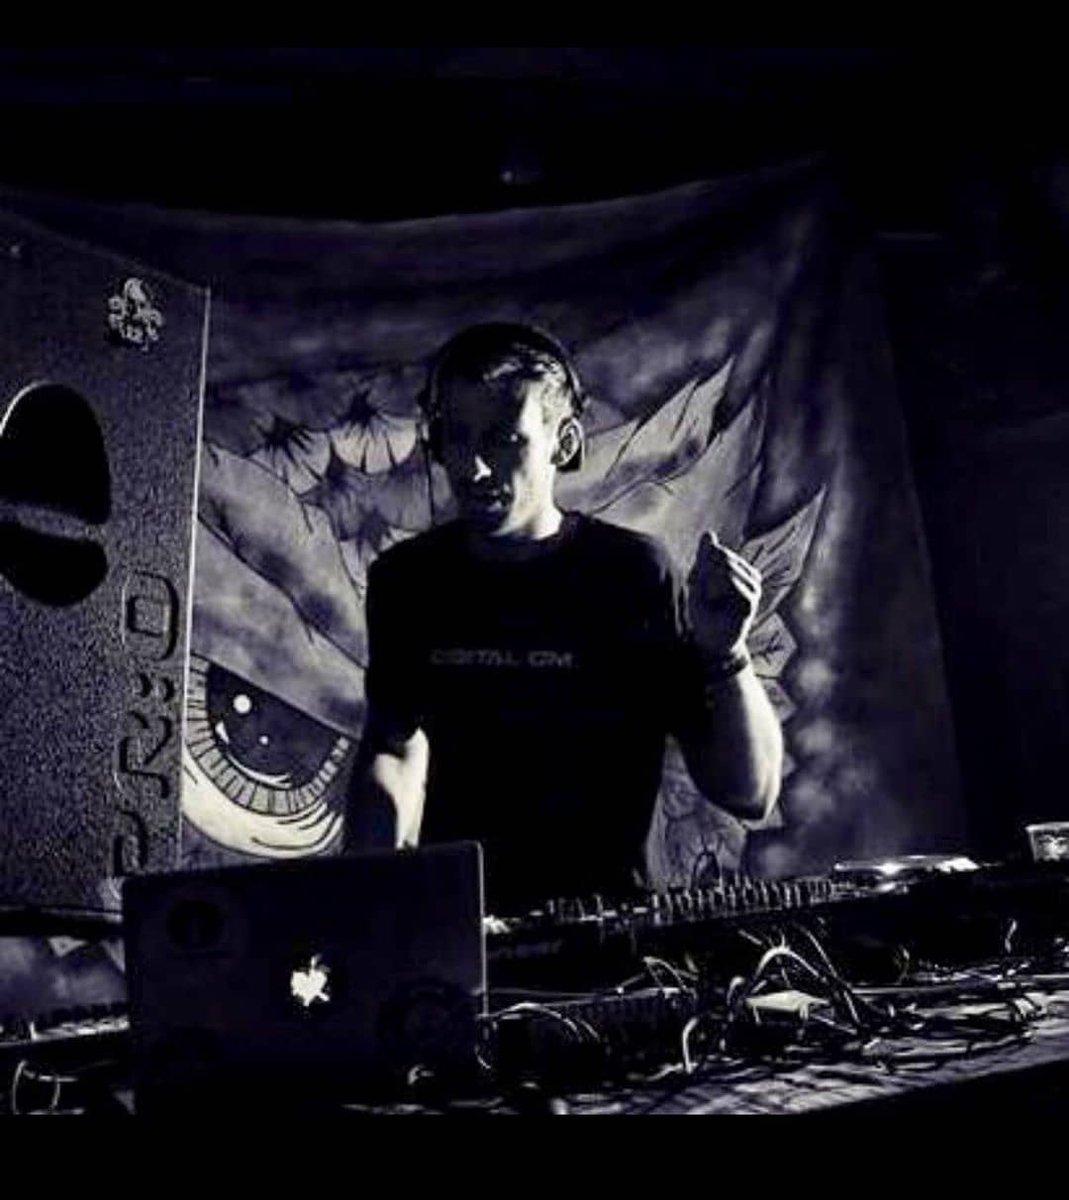 Kevin from #Atacama ->>Dancing in the dark 😁 😎 Portugal 2017 @ Kunayala Productions  #atacamamusic #digitalom #indoortour #club #clubtour #clubcultur #clubstyle #wintertour #psytrance #progressive #progressivetrance #goatrance #psychedelic #psychedelicmusic #psychedelictrance